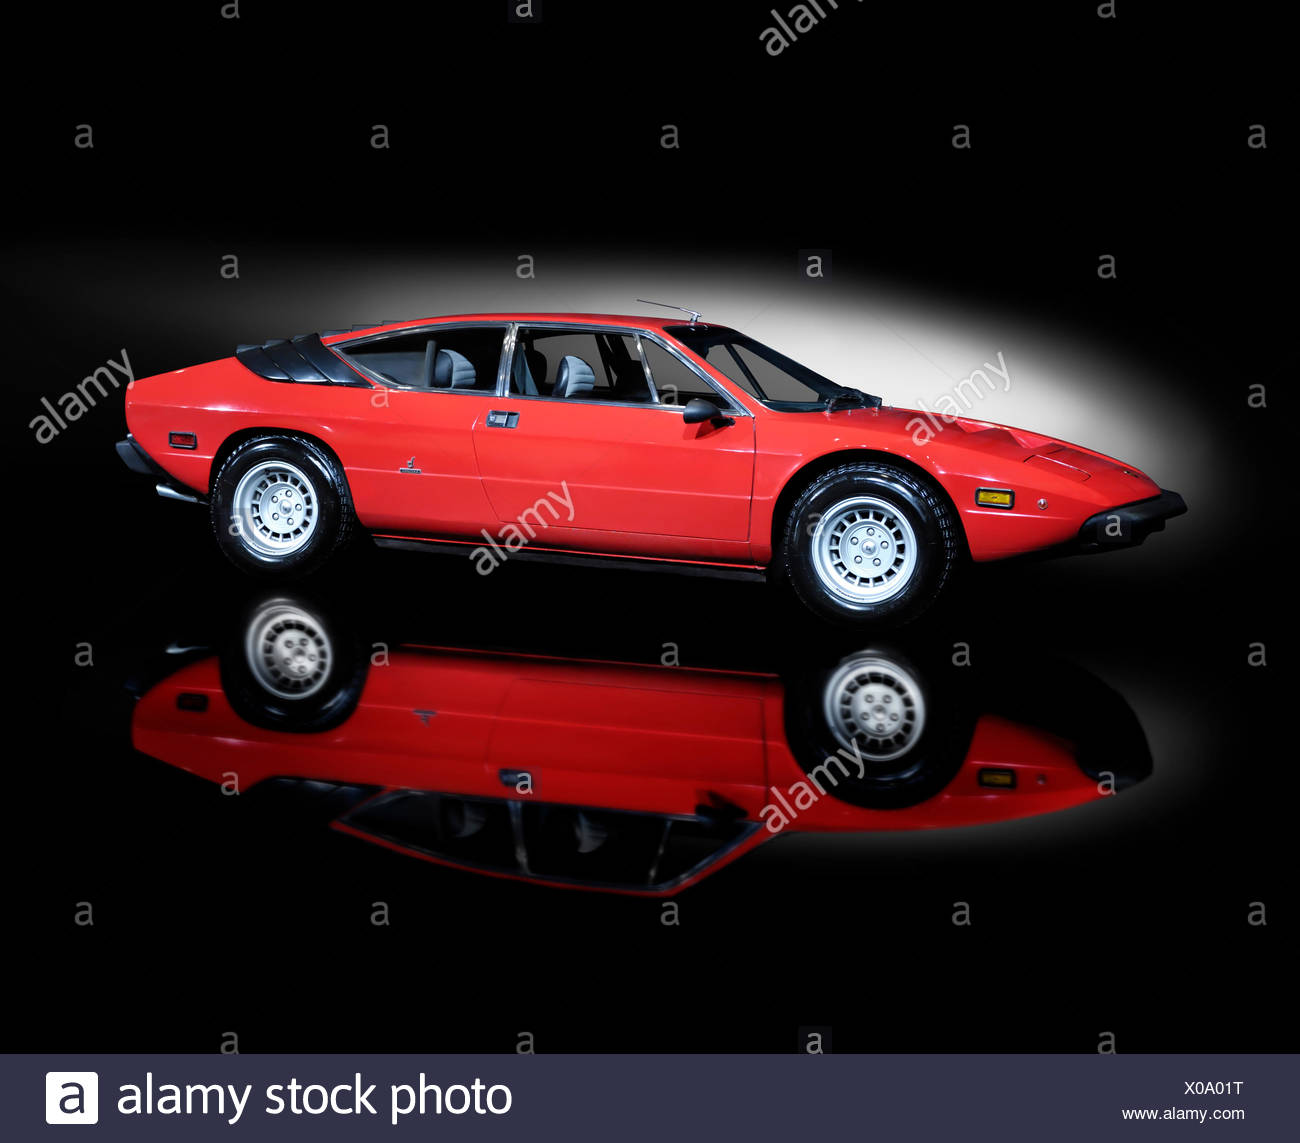 Lamborghini Urraco rouge, 1972, super voiture rétro Photo Stock